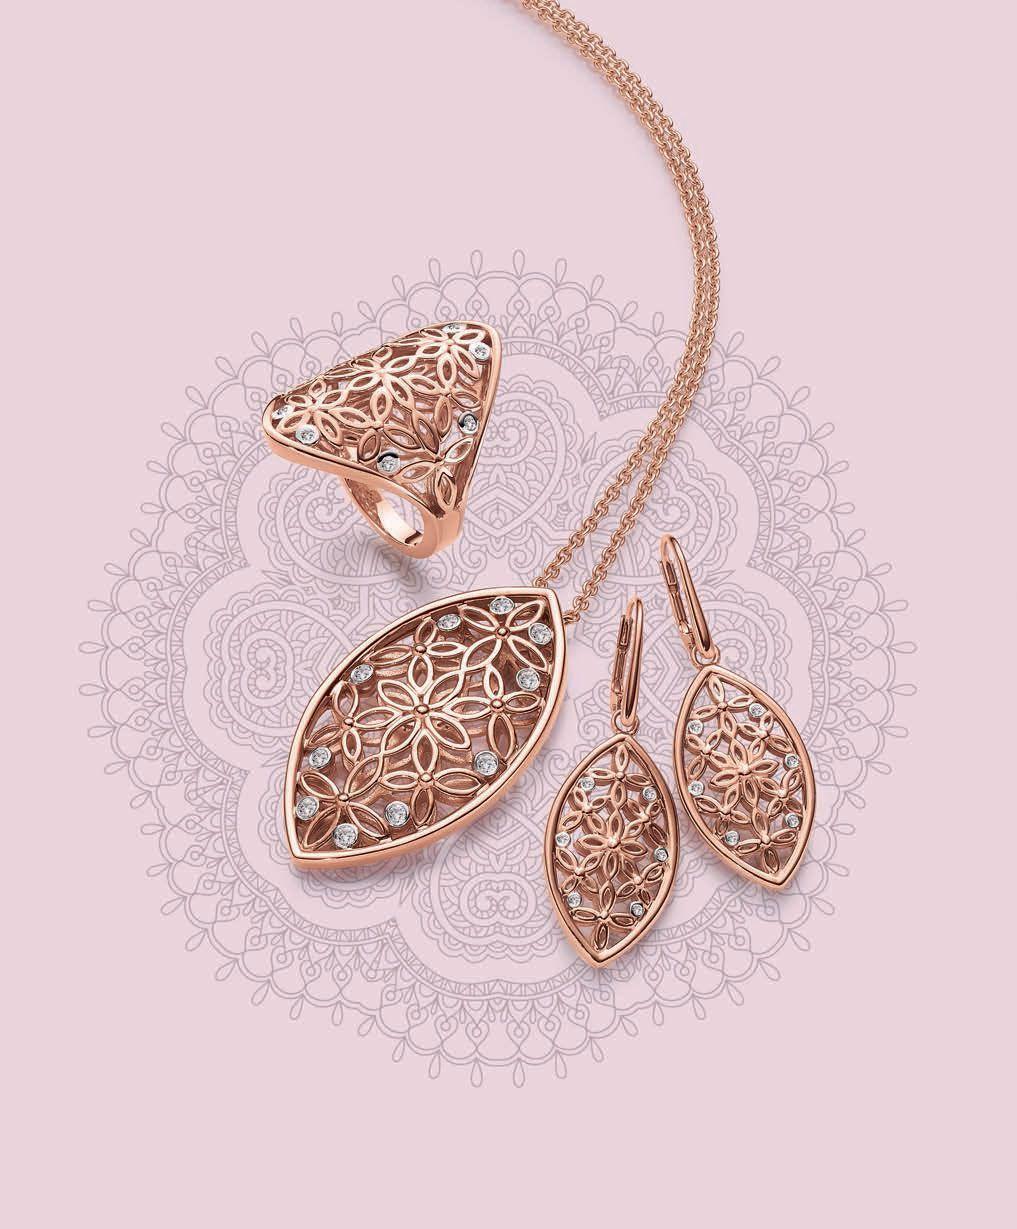 Viventy Jewels Retro Flowers Ring Collier And Earrings Sormus Kaulakoru Ja Korvakorut Www Diamond Pendants Designs Diamond Pendant Sets Jewelry Sets